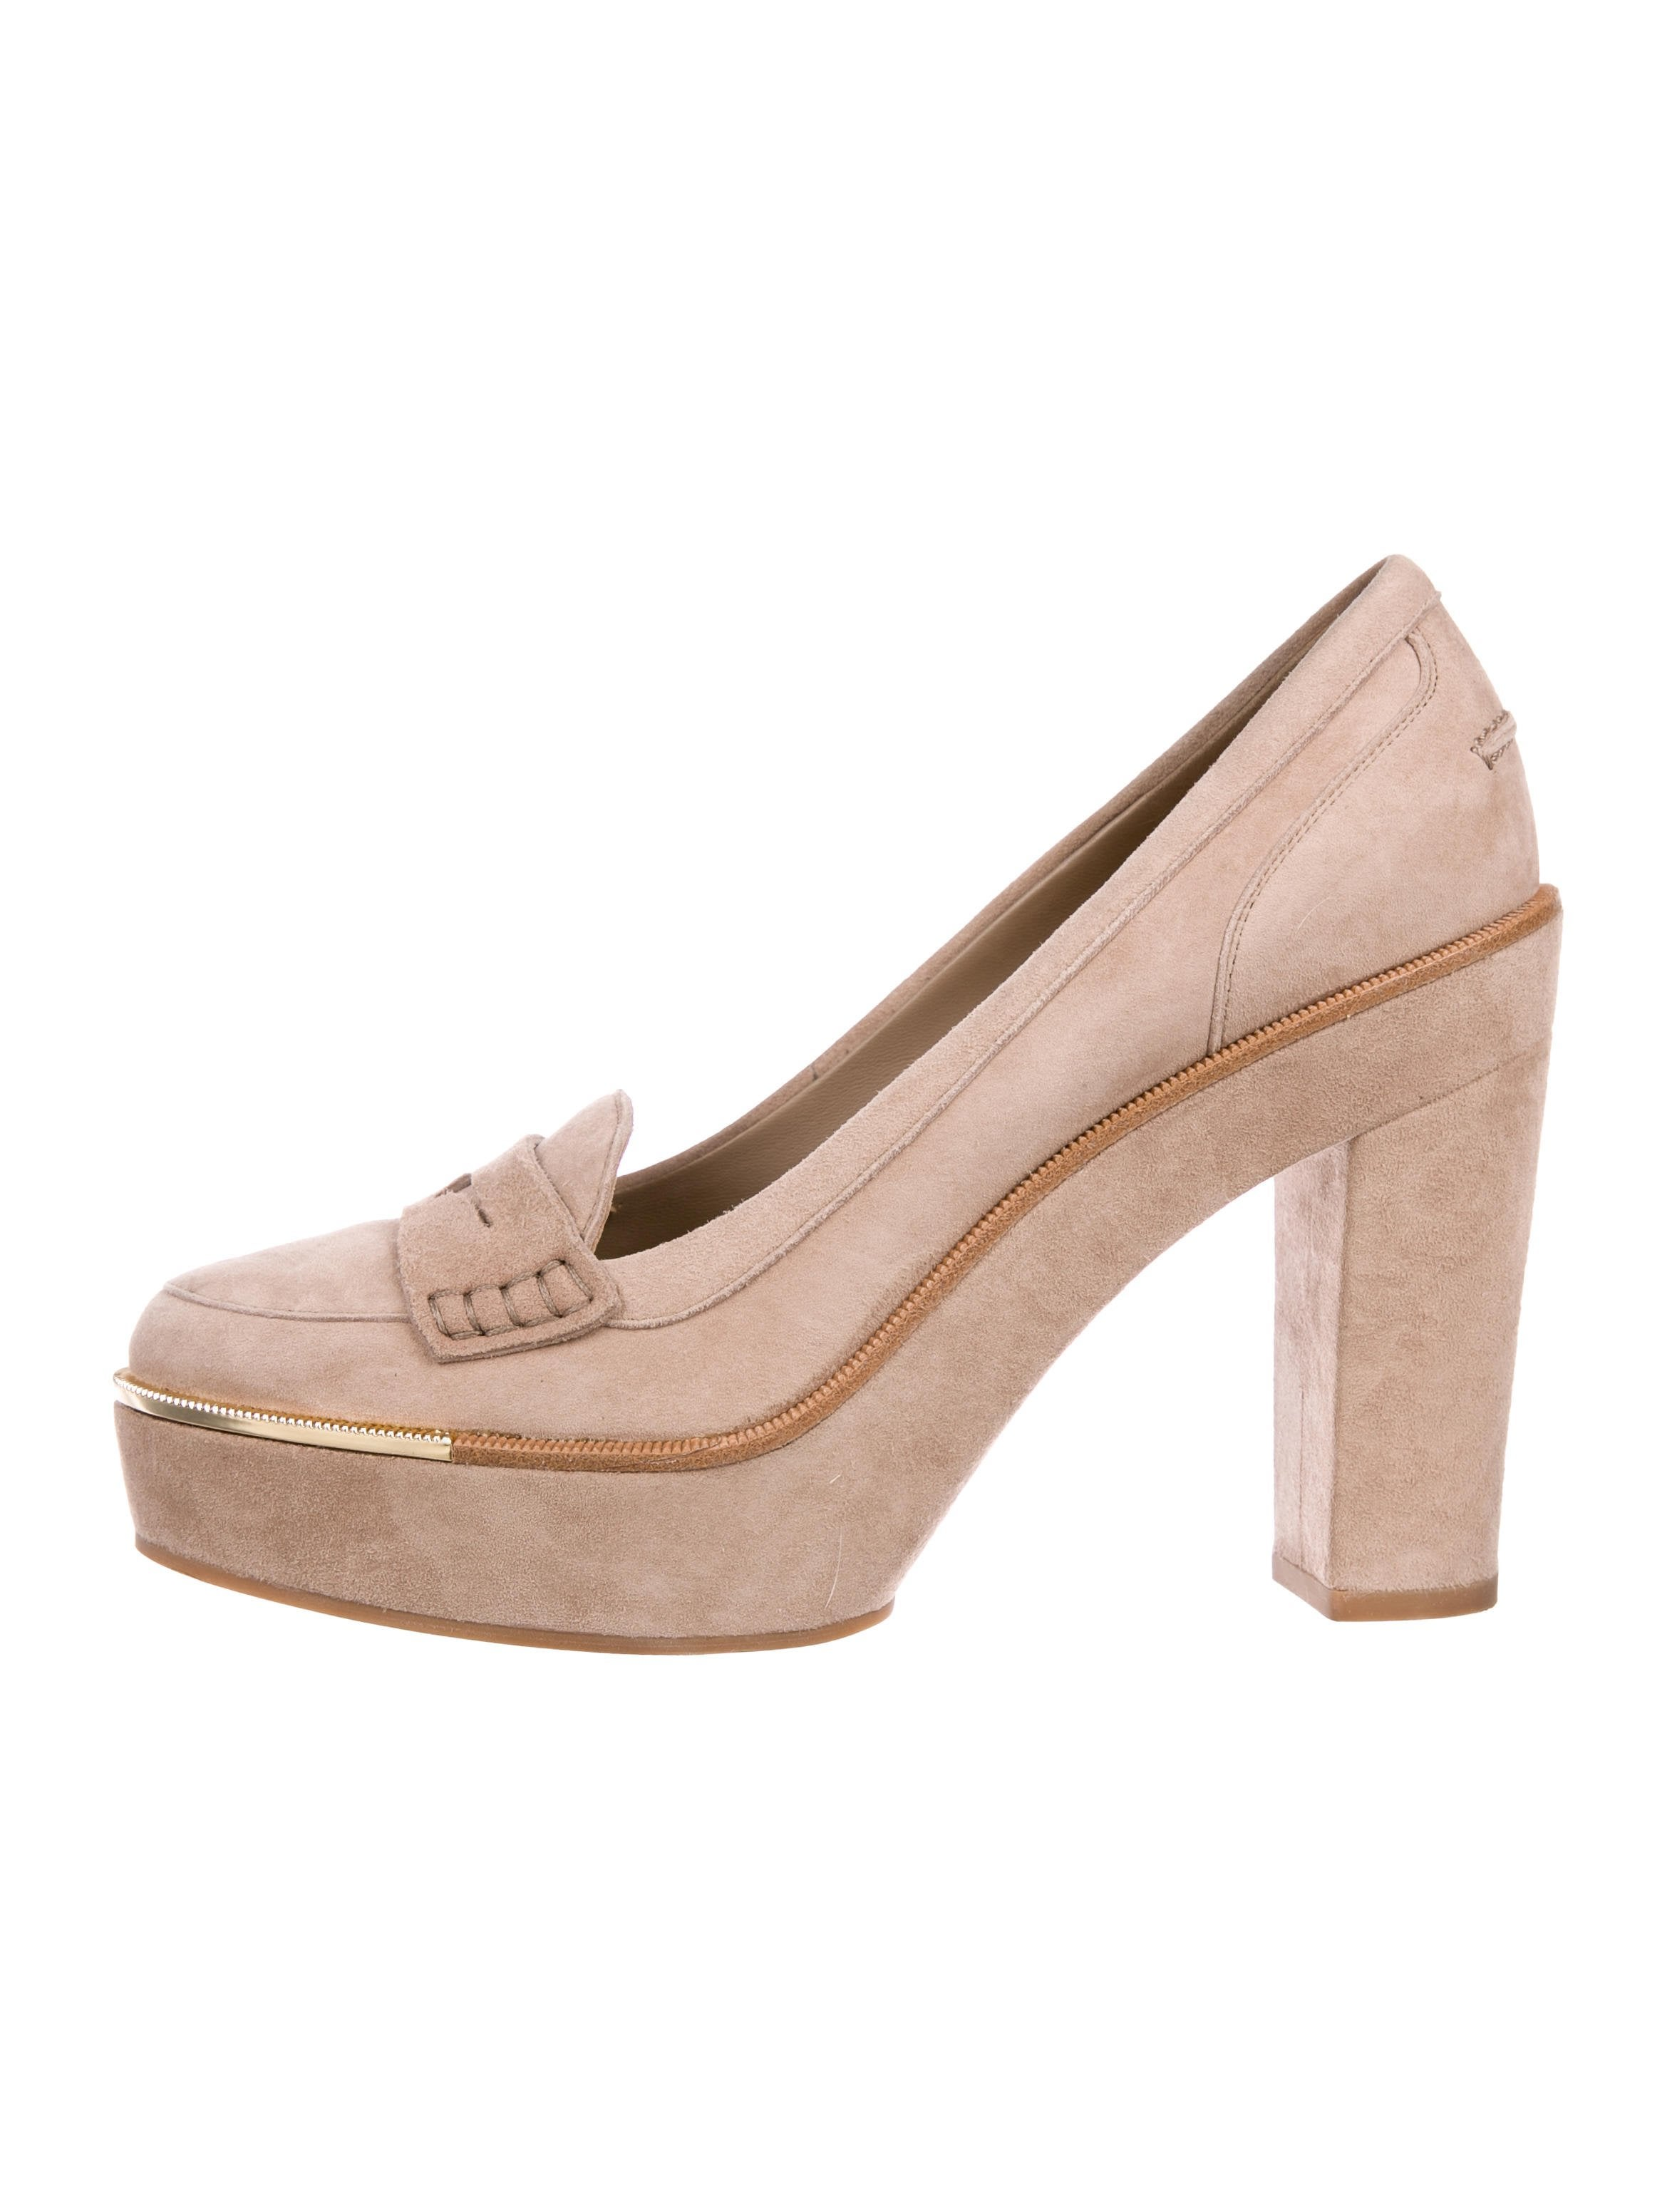 f7a00bbadfeb Salvatore Ferragamo Suede Platform Pumps - Shoes - SAL94846